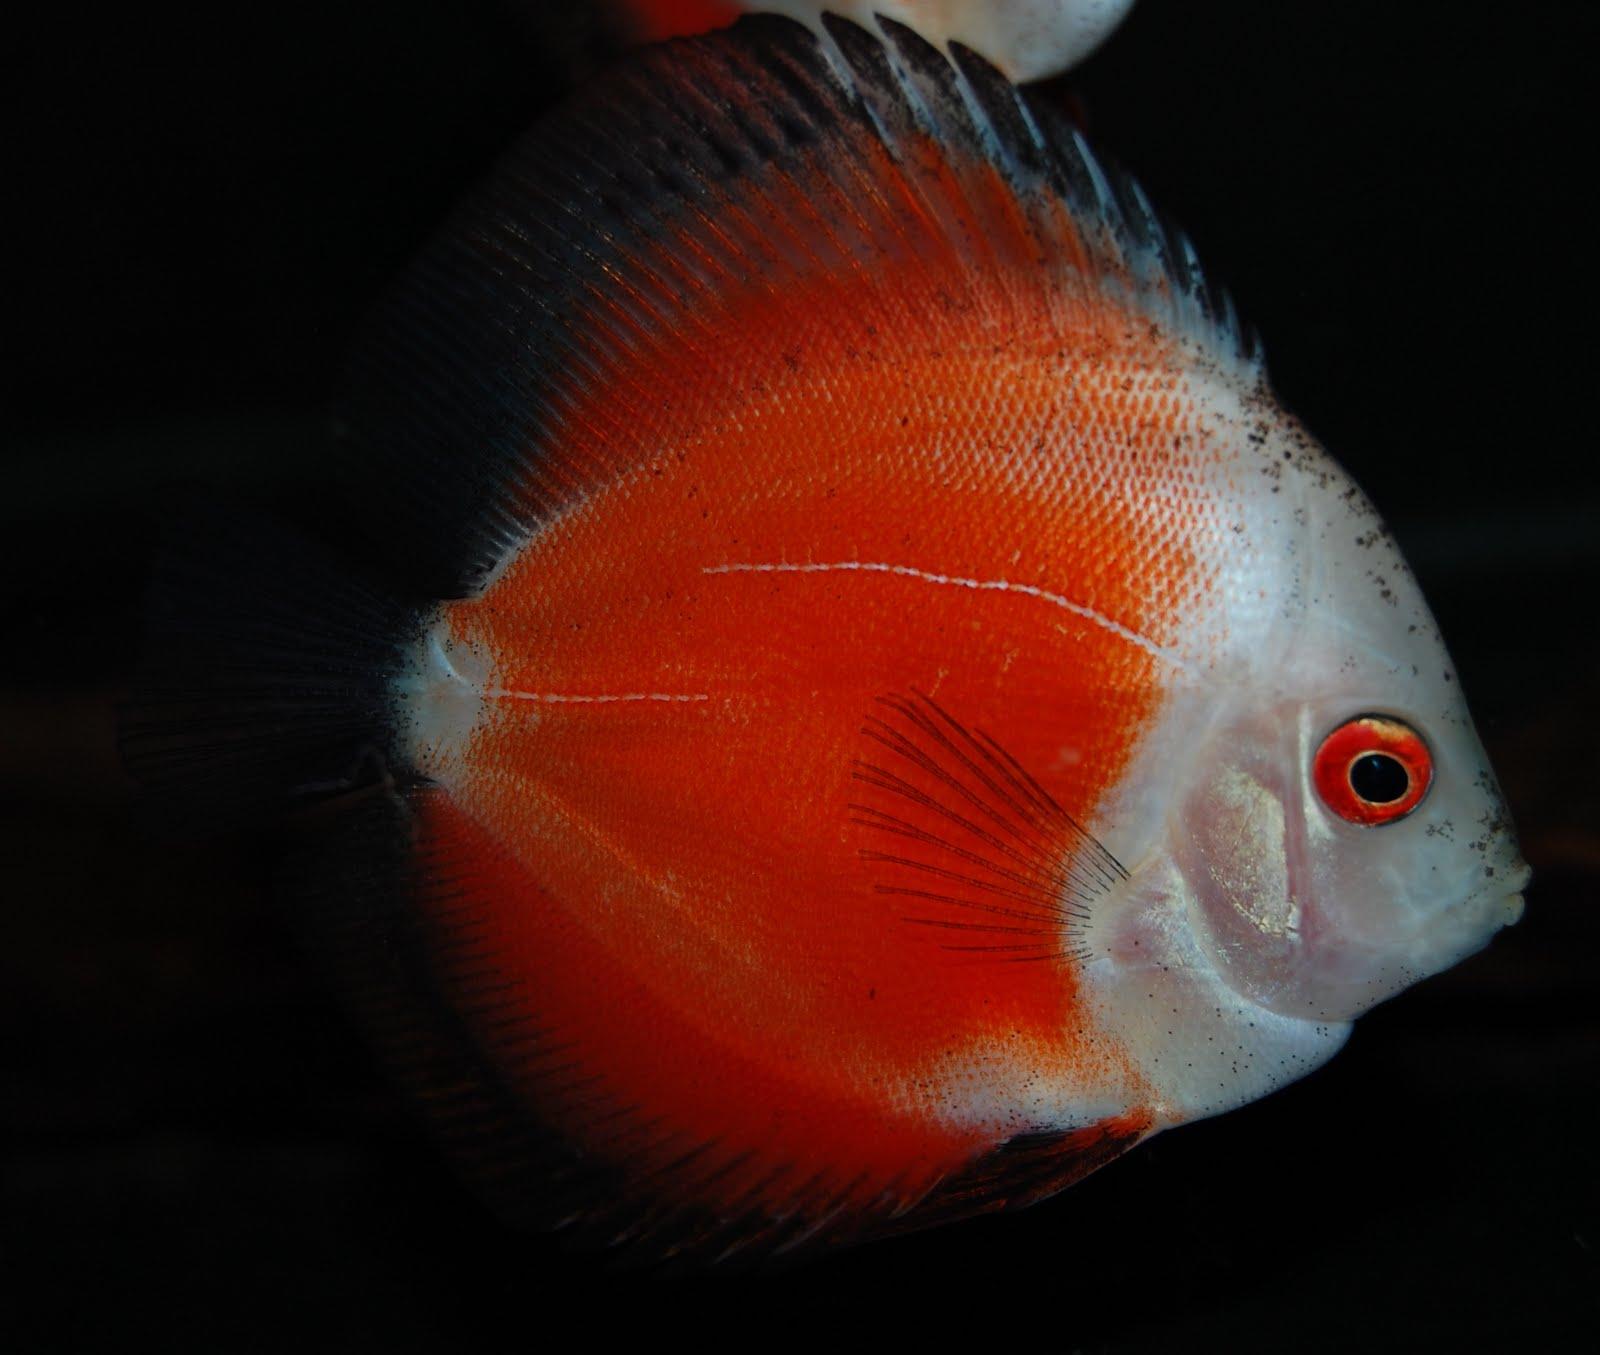 PIER AQUATICS NEW ARRIVALS: Marlboro red discus